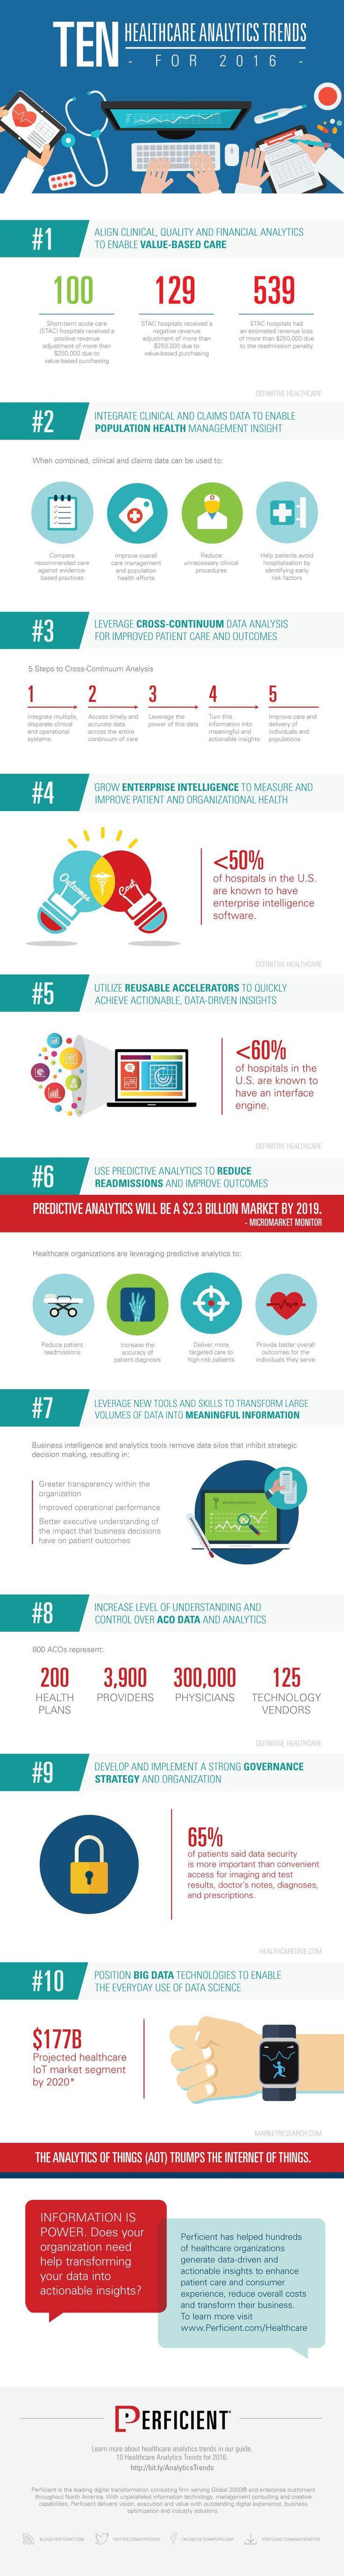 Healthcare Analytics Trends to Watch